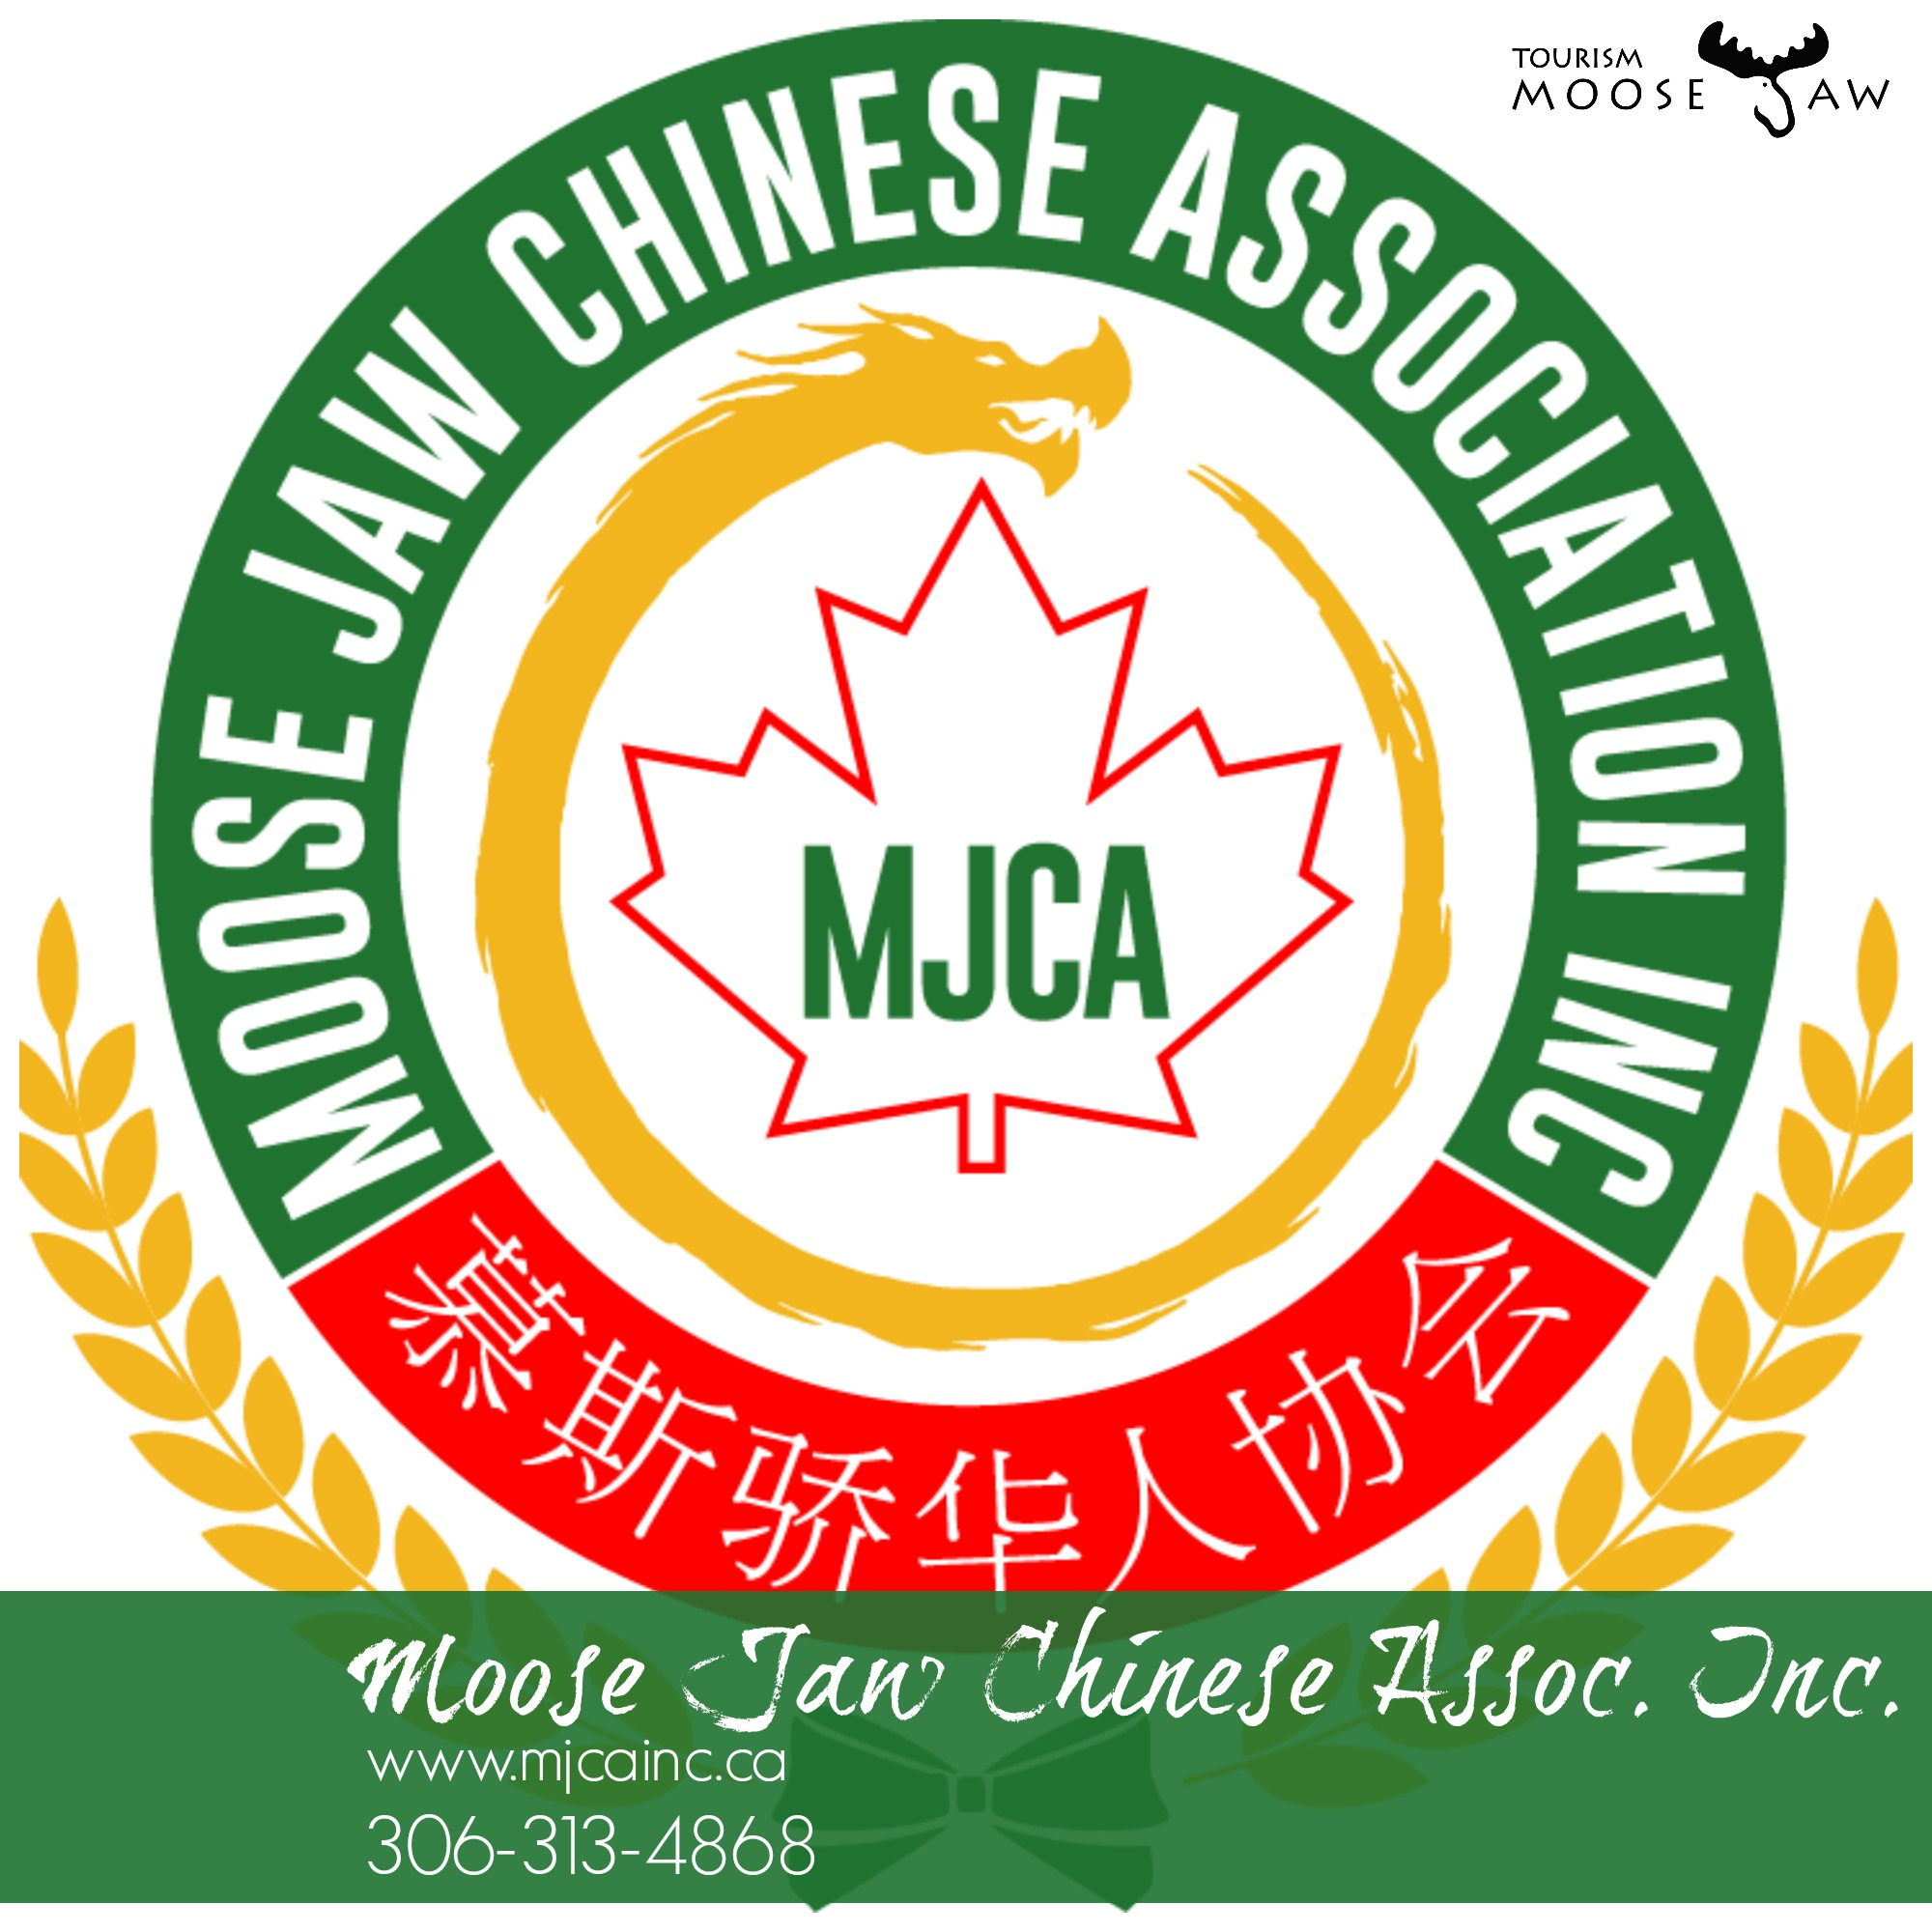 MJ Chinese Assoc..jpg